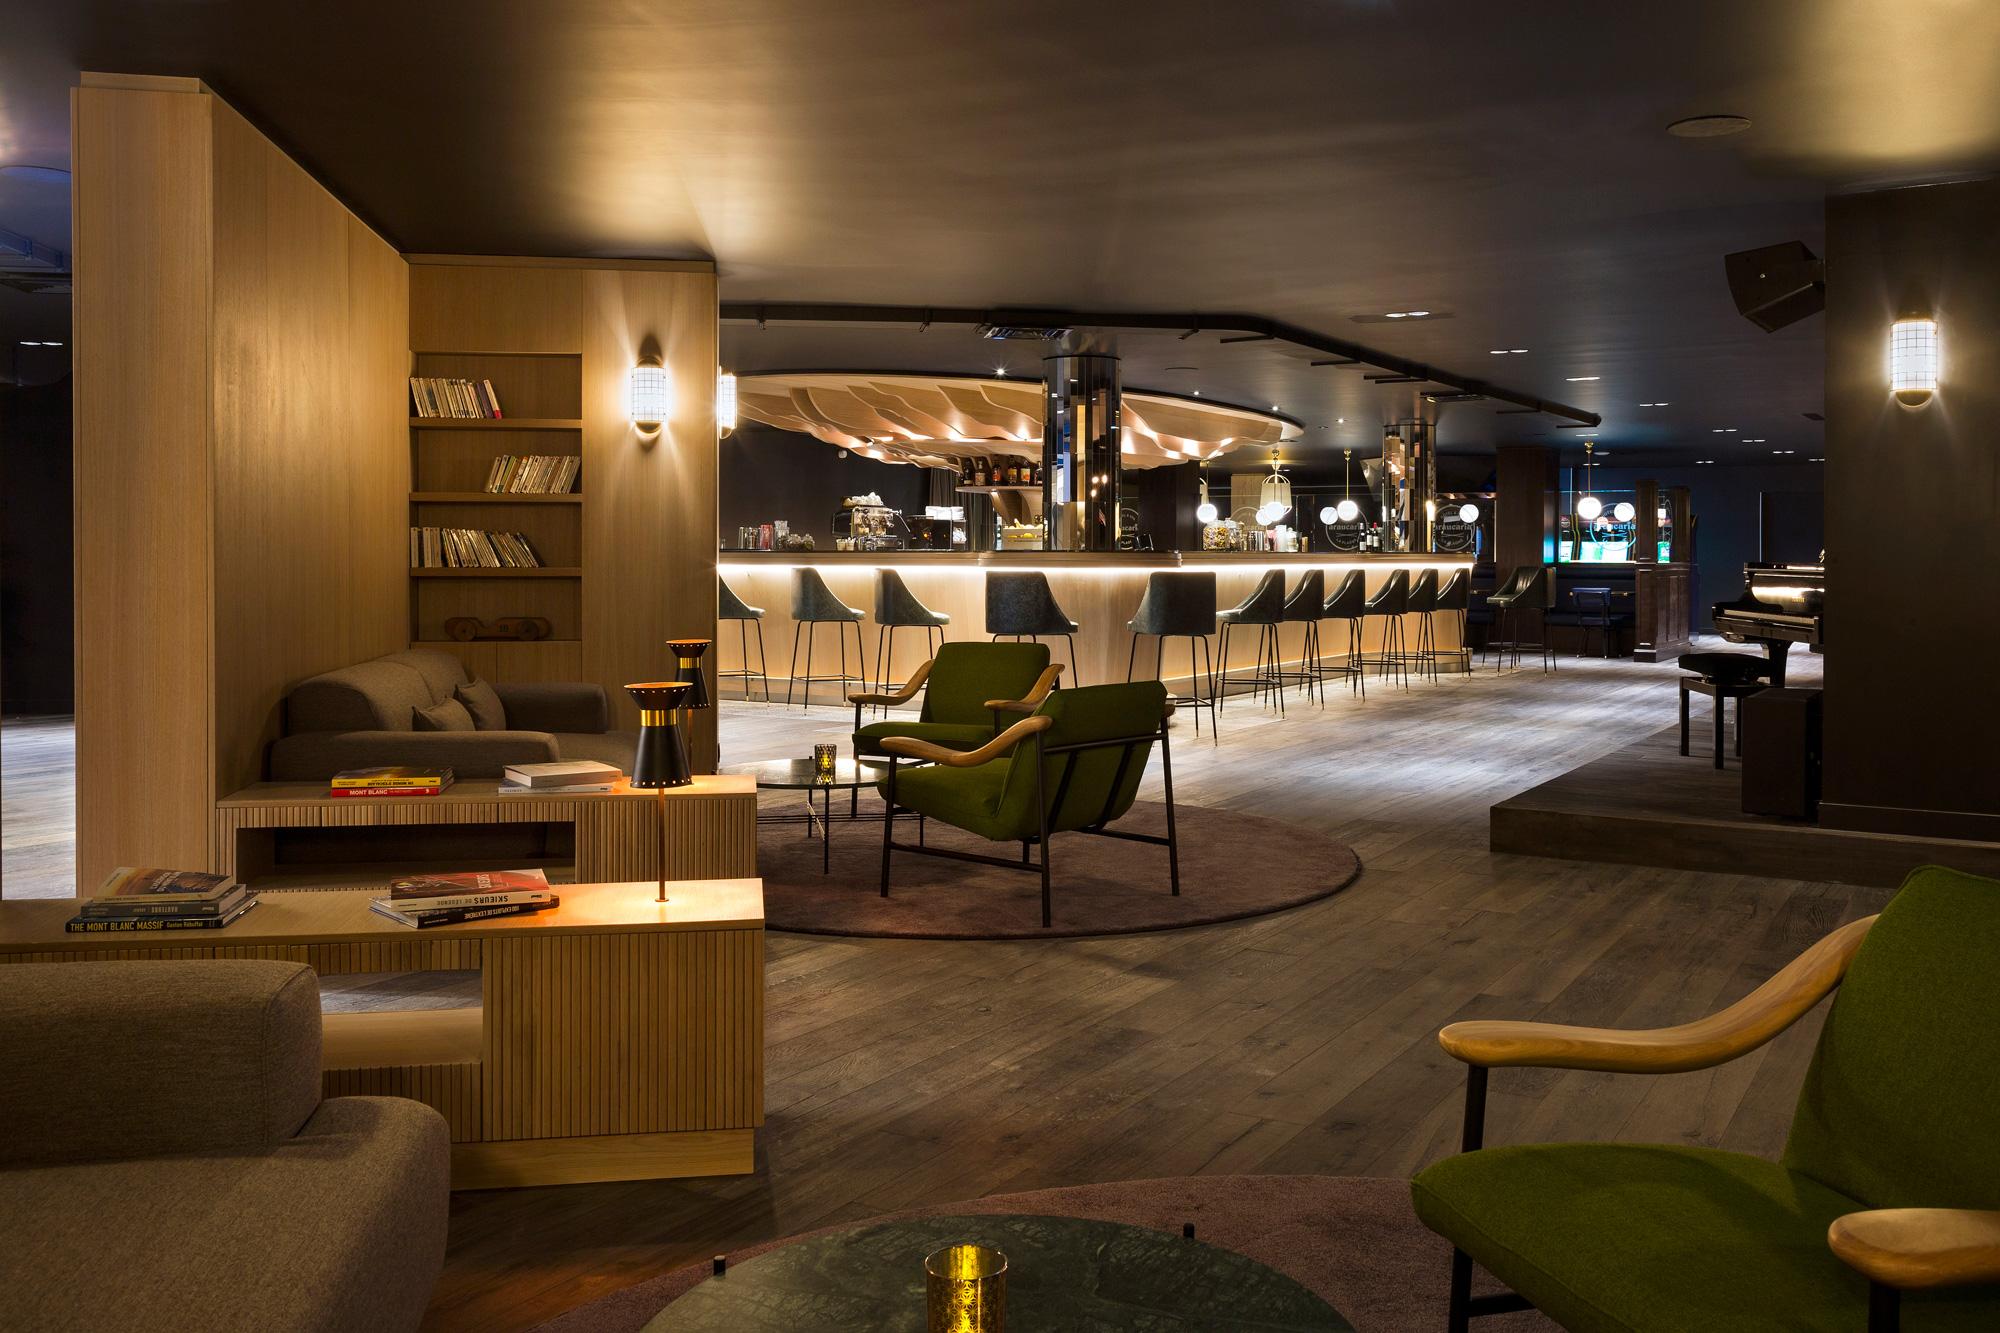 2-Araucaria-Hotel-Spa-Lobby-bar-HD